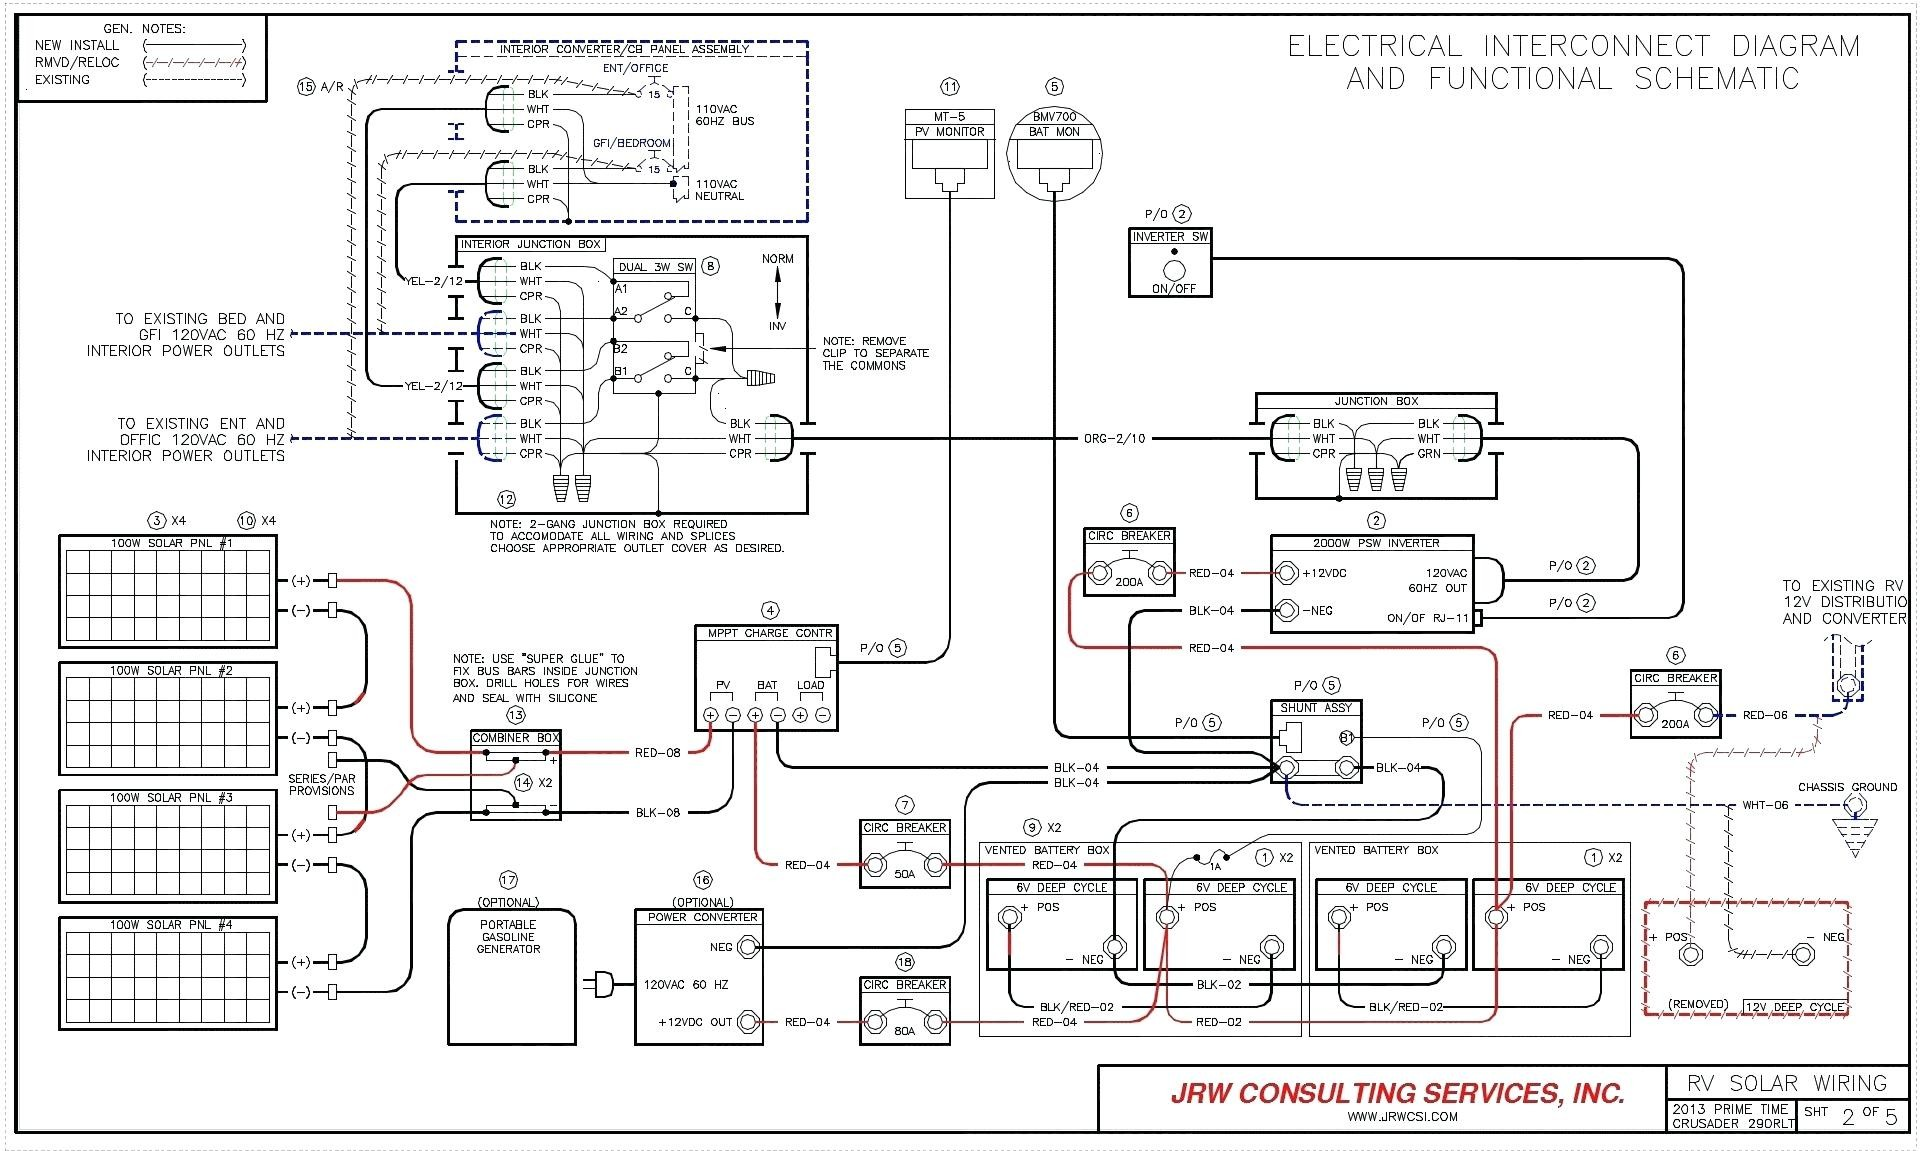 bluebird bus wiring diagram domestic diagrams australia blue bird schematics great installation of 1994 third level rh 16 19 21 jacobwinterstein com 1999